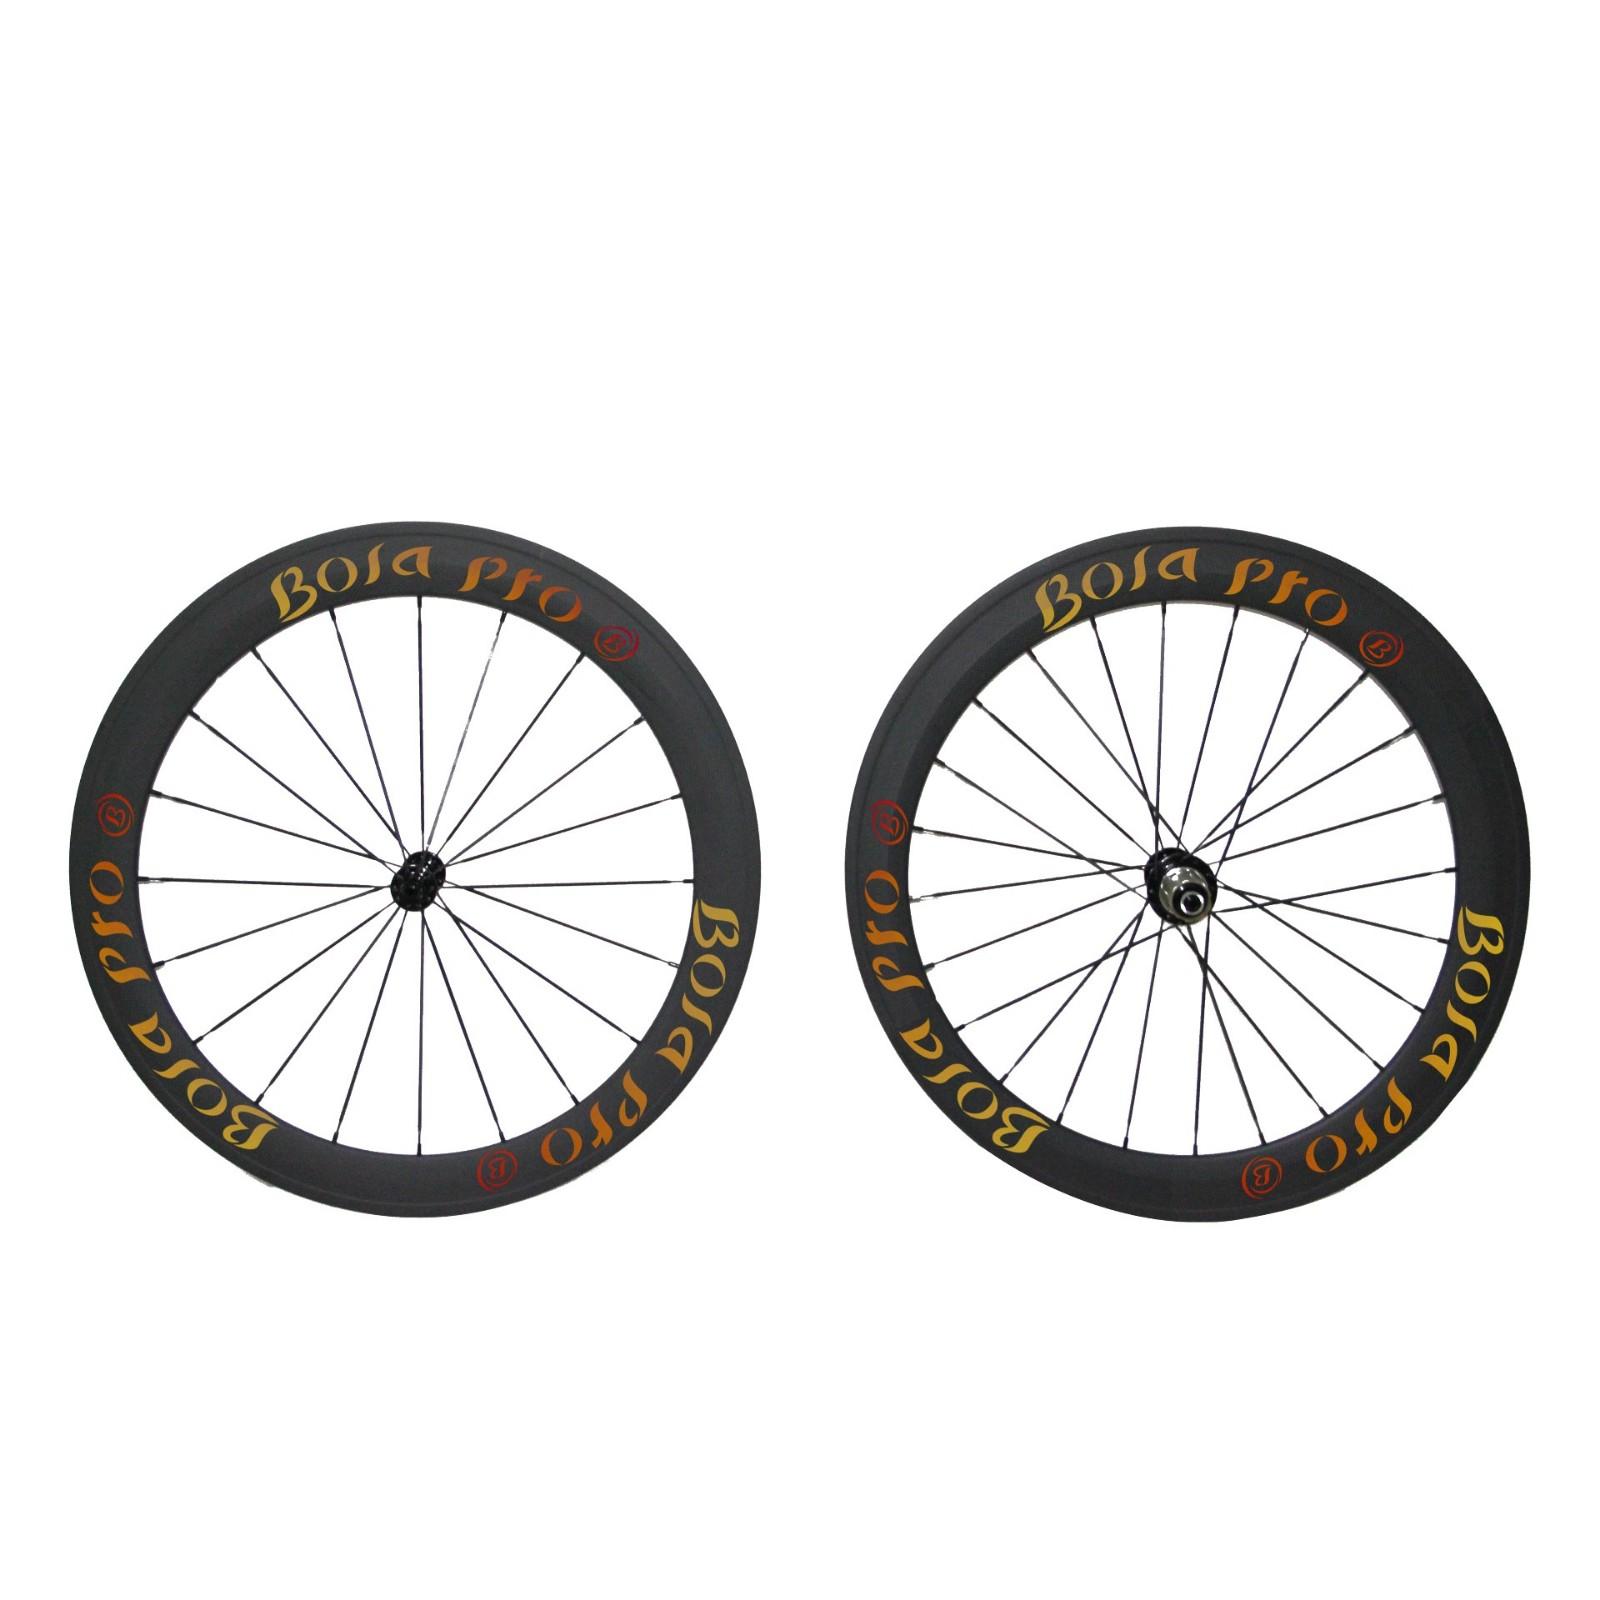 700C 50mm carbon wheelset with ceramic bearing hub